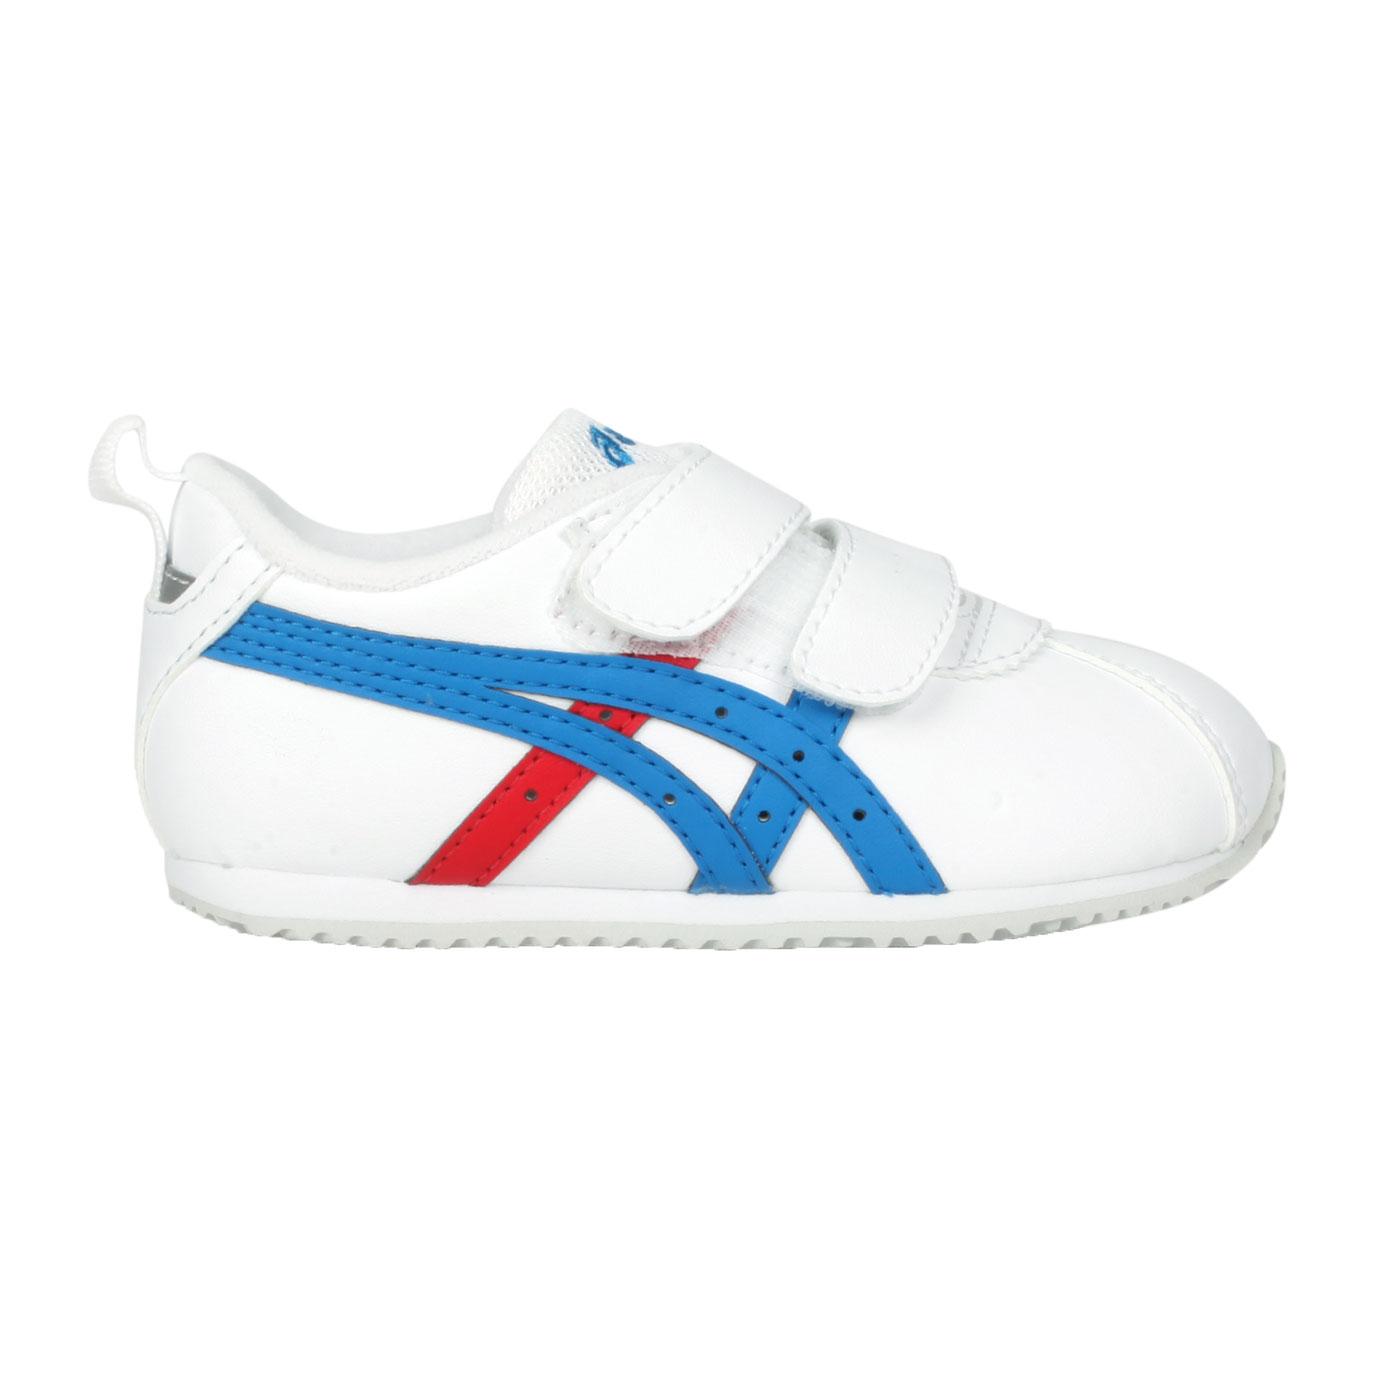 ASICS 小童運動休閒鞋  @CORSAIR BABY SL 2@1144A151-101